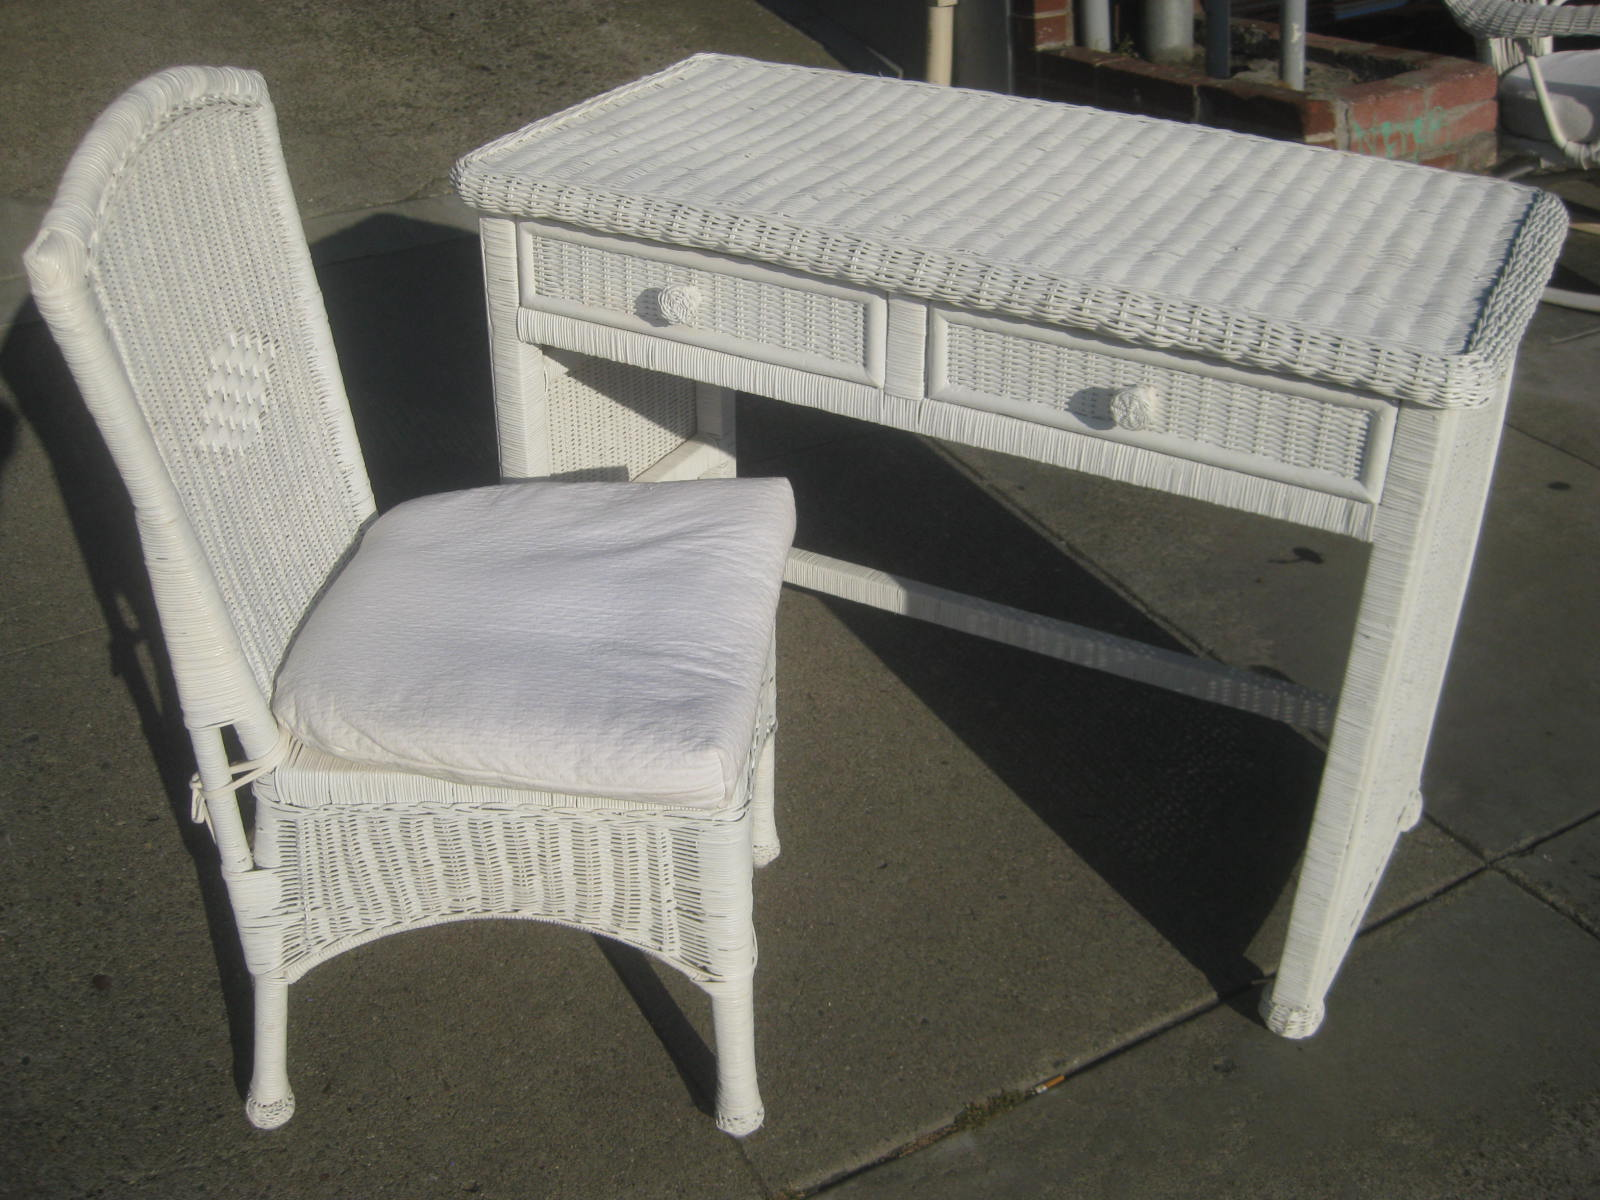 uhuru furniture collectibles sold wicker bedroom furniture. Black Bedroom Furniture Sets. Home Design Ideas